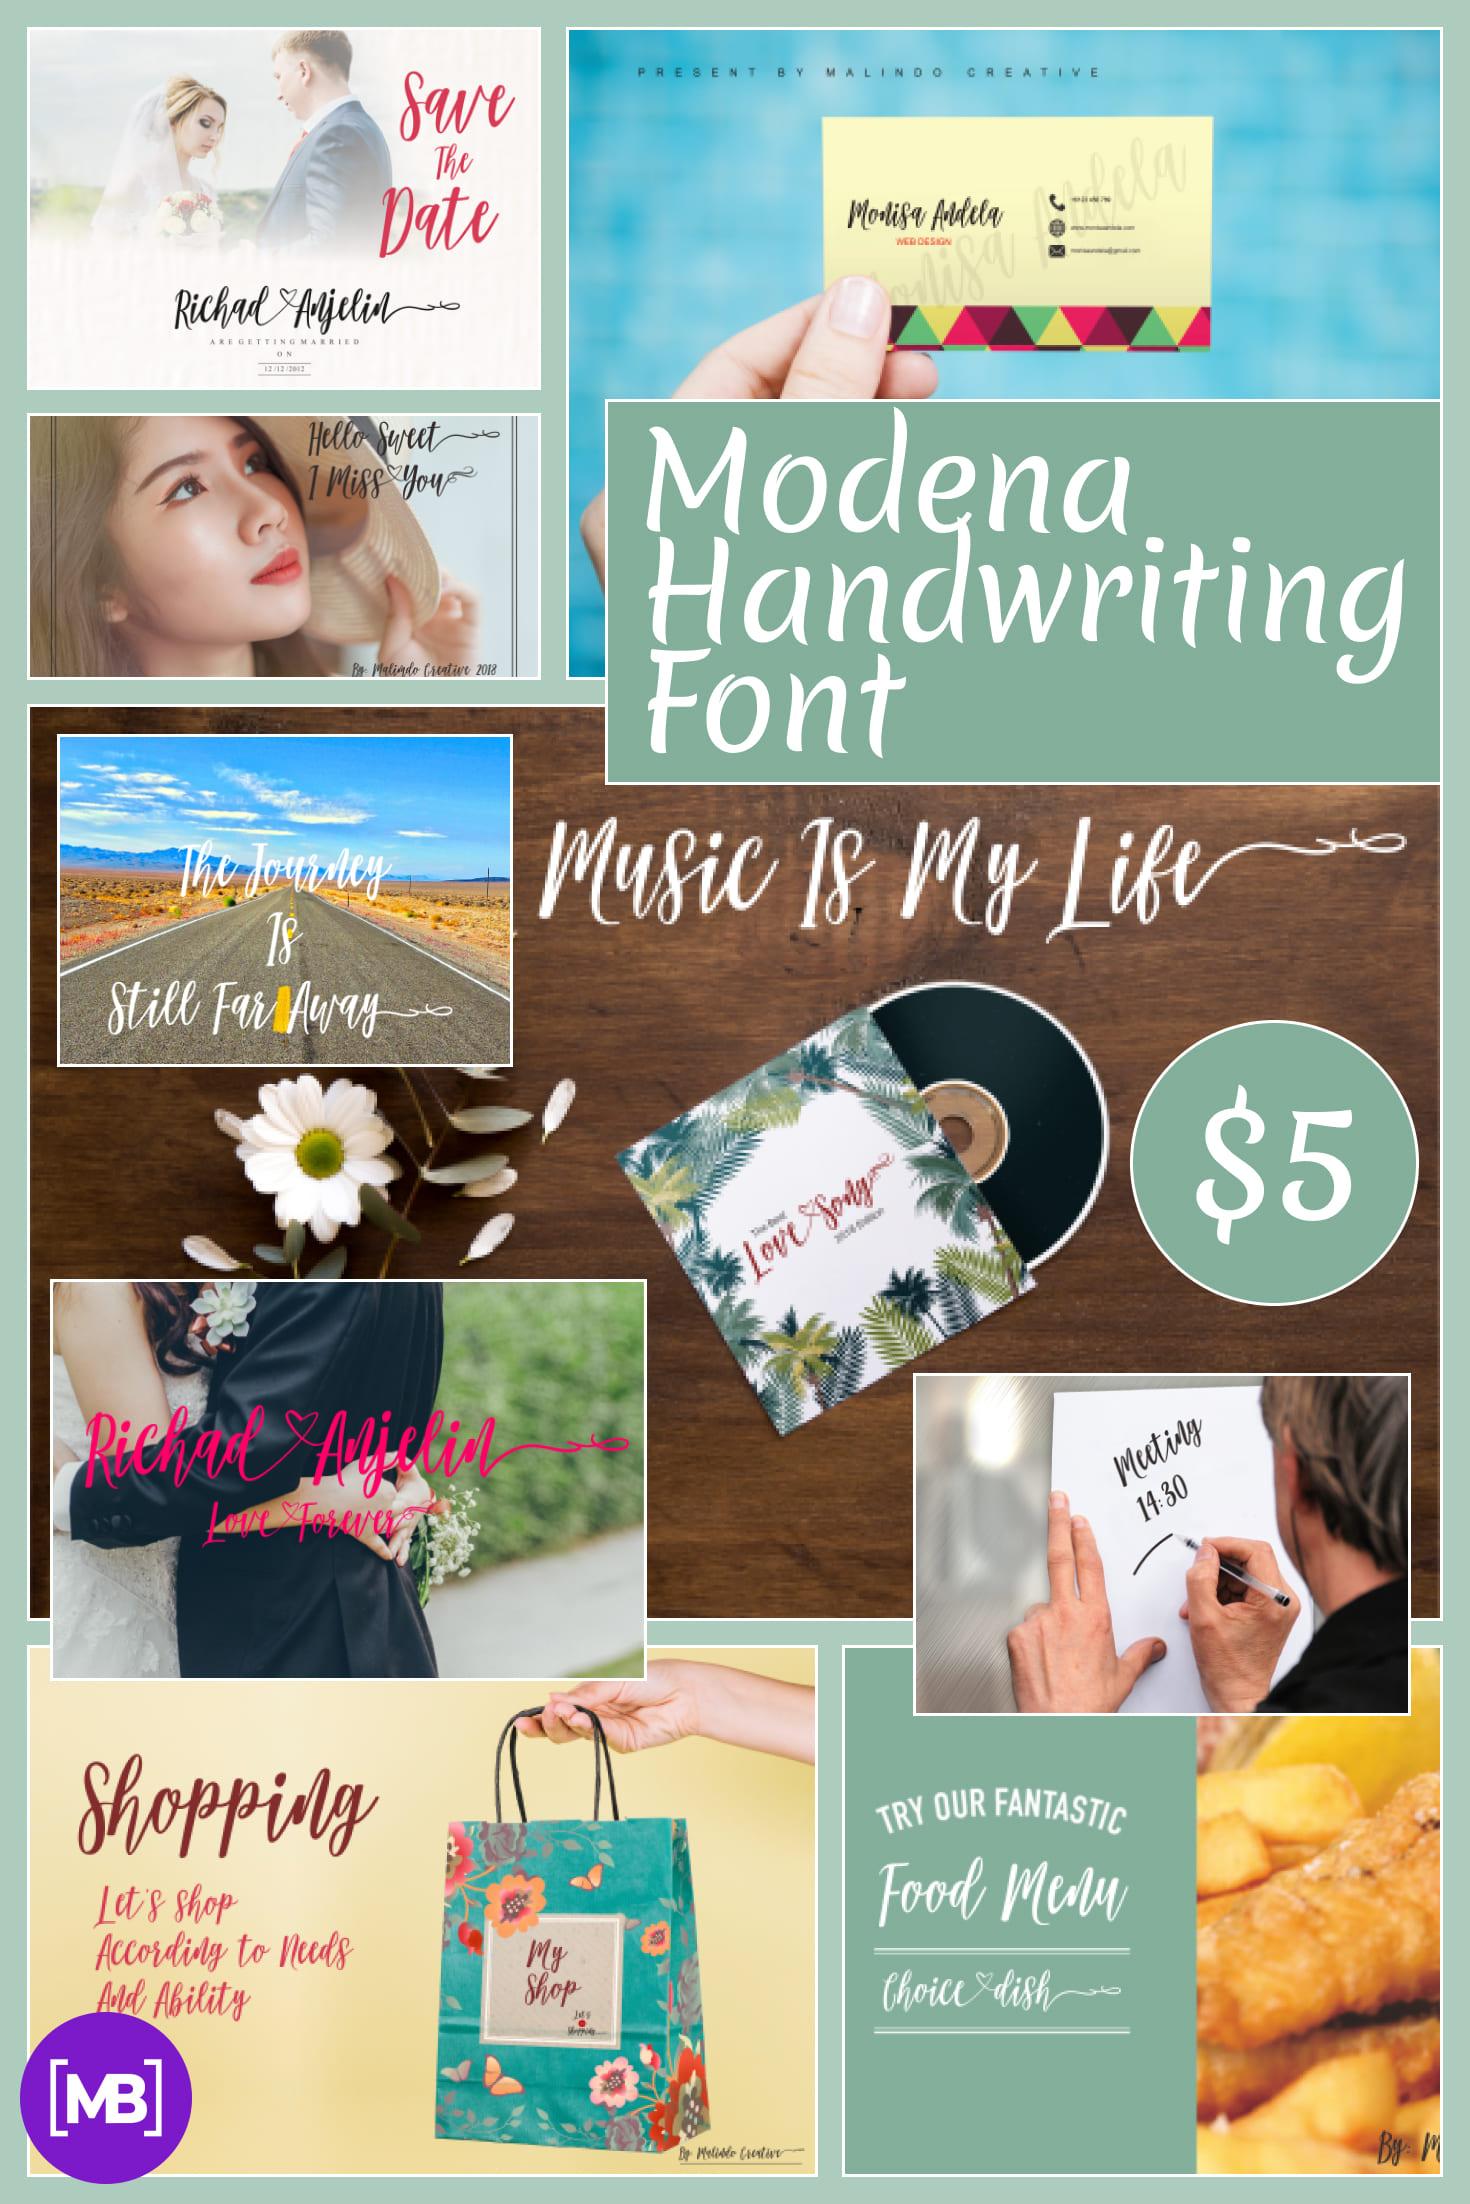 Pinterest Image: Modena Handwriting Font - $5.